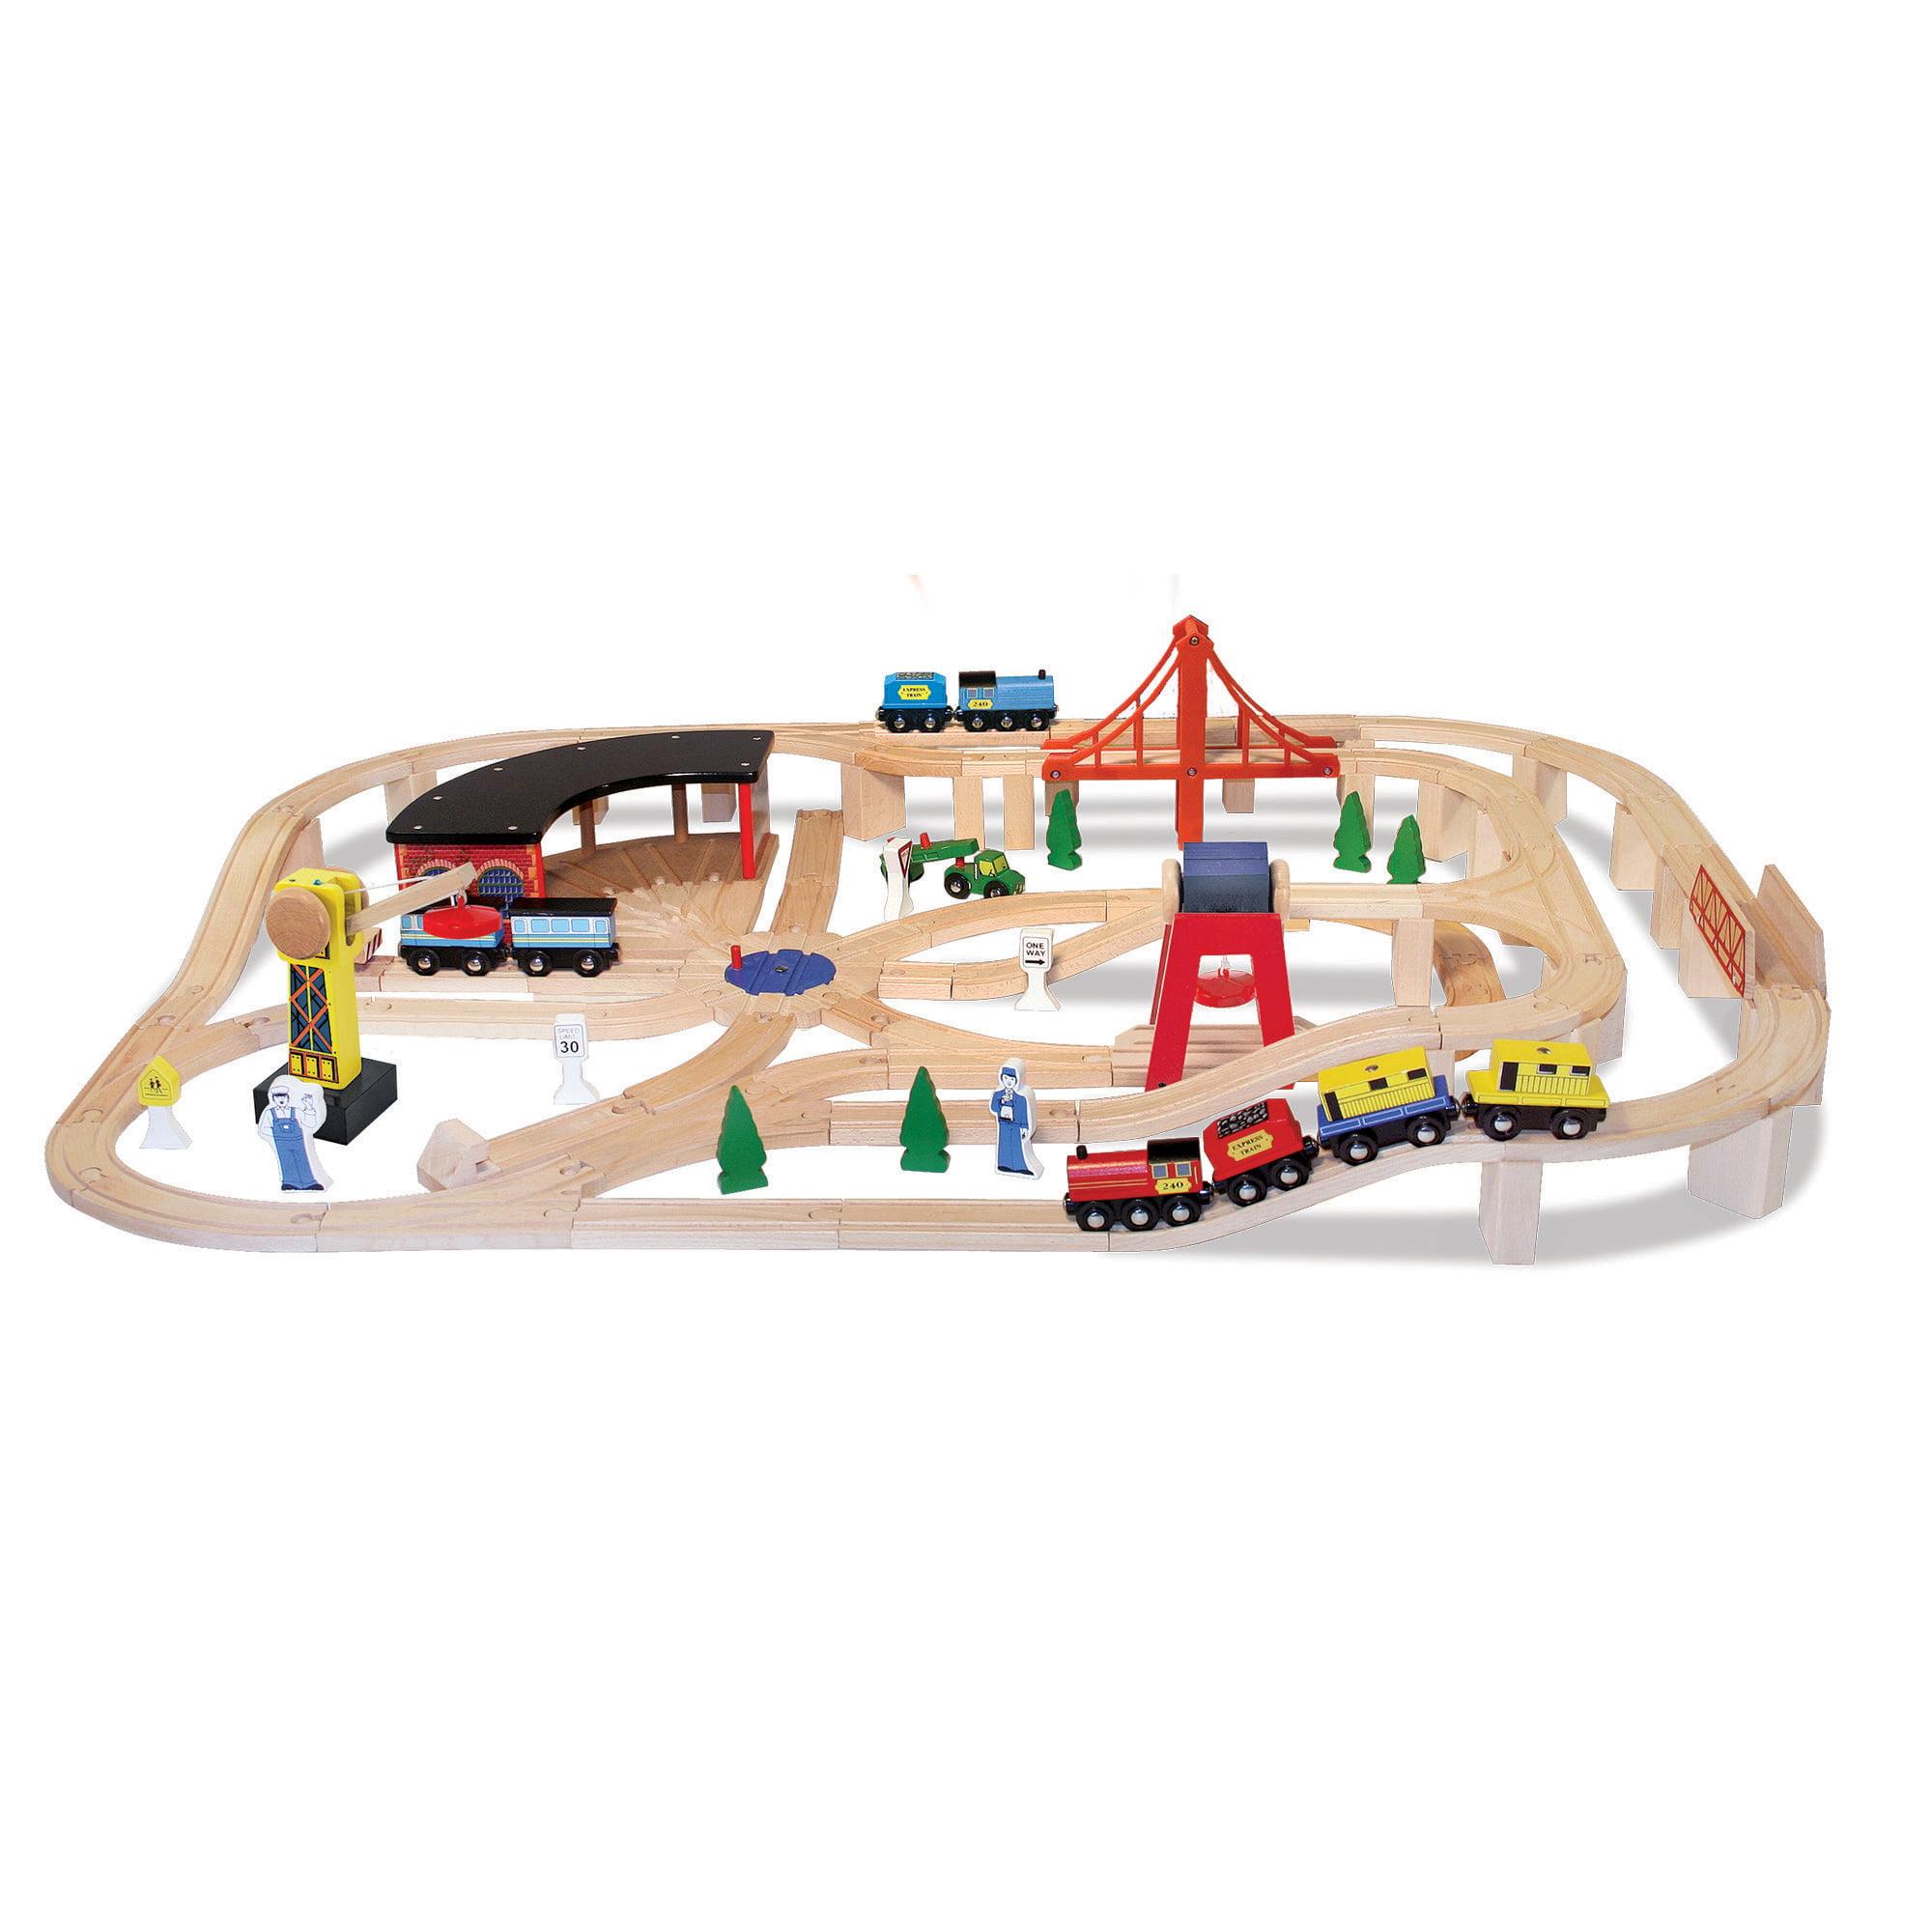 Melissa & Doug Wooden Railway Set (Vehicles, High-Quality Construction, 130 Pieces, 17? H x 5? W x 28? L)